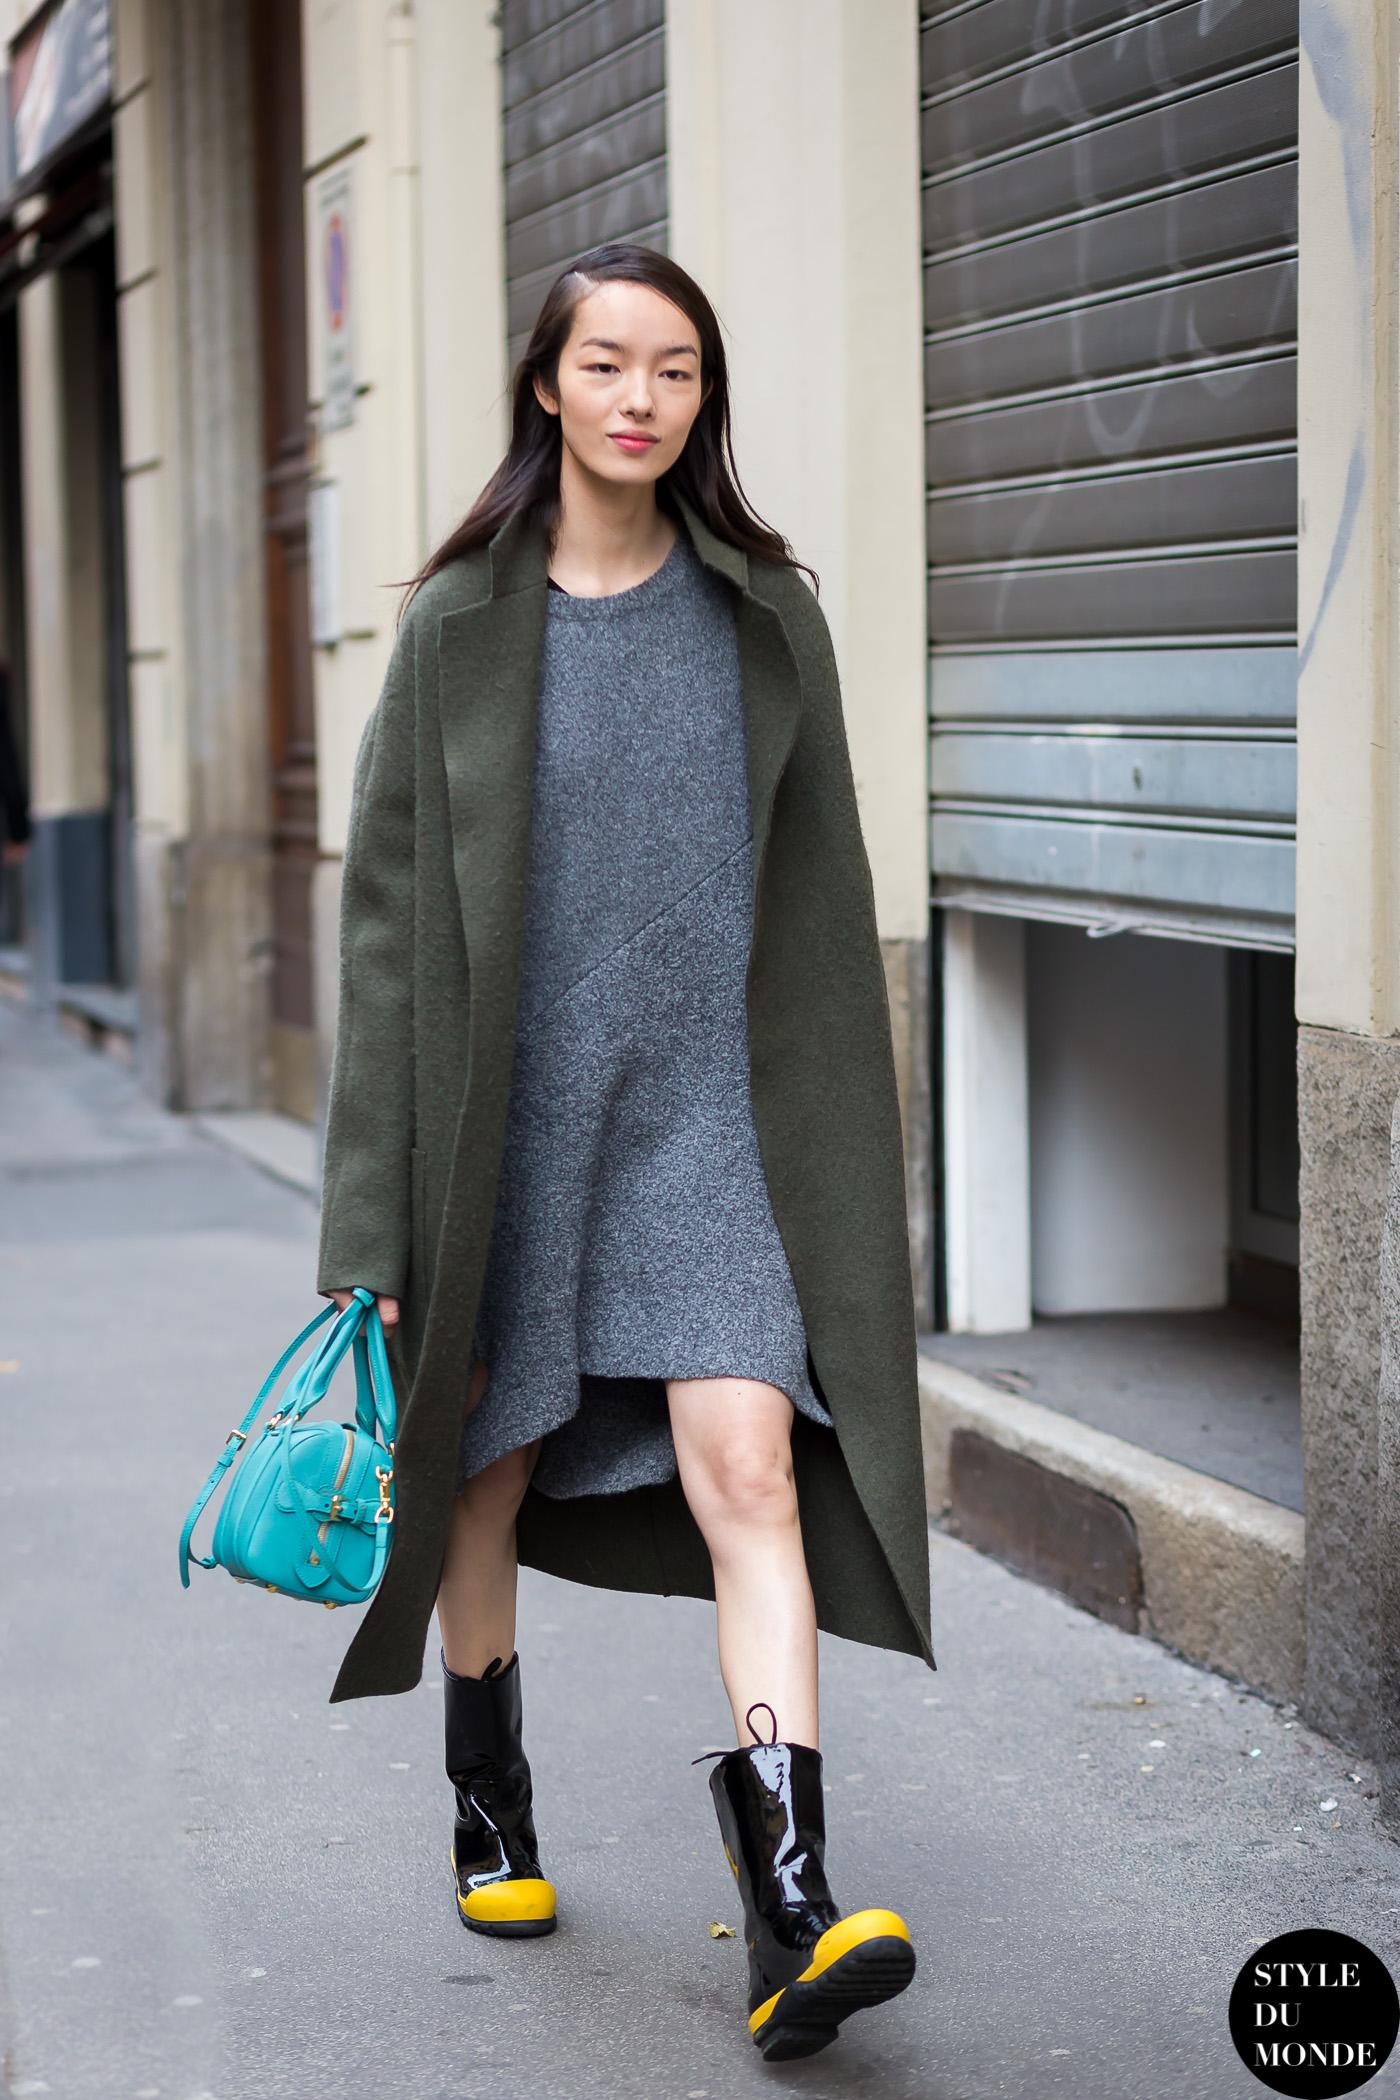 fei-fei-sun-by-styledumonde-street-style-fashion-blog_mg_2269